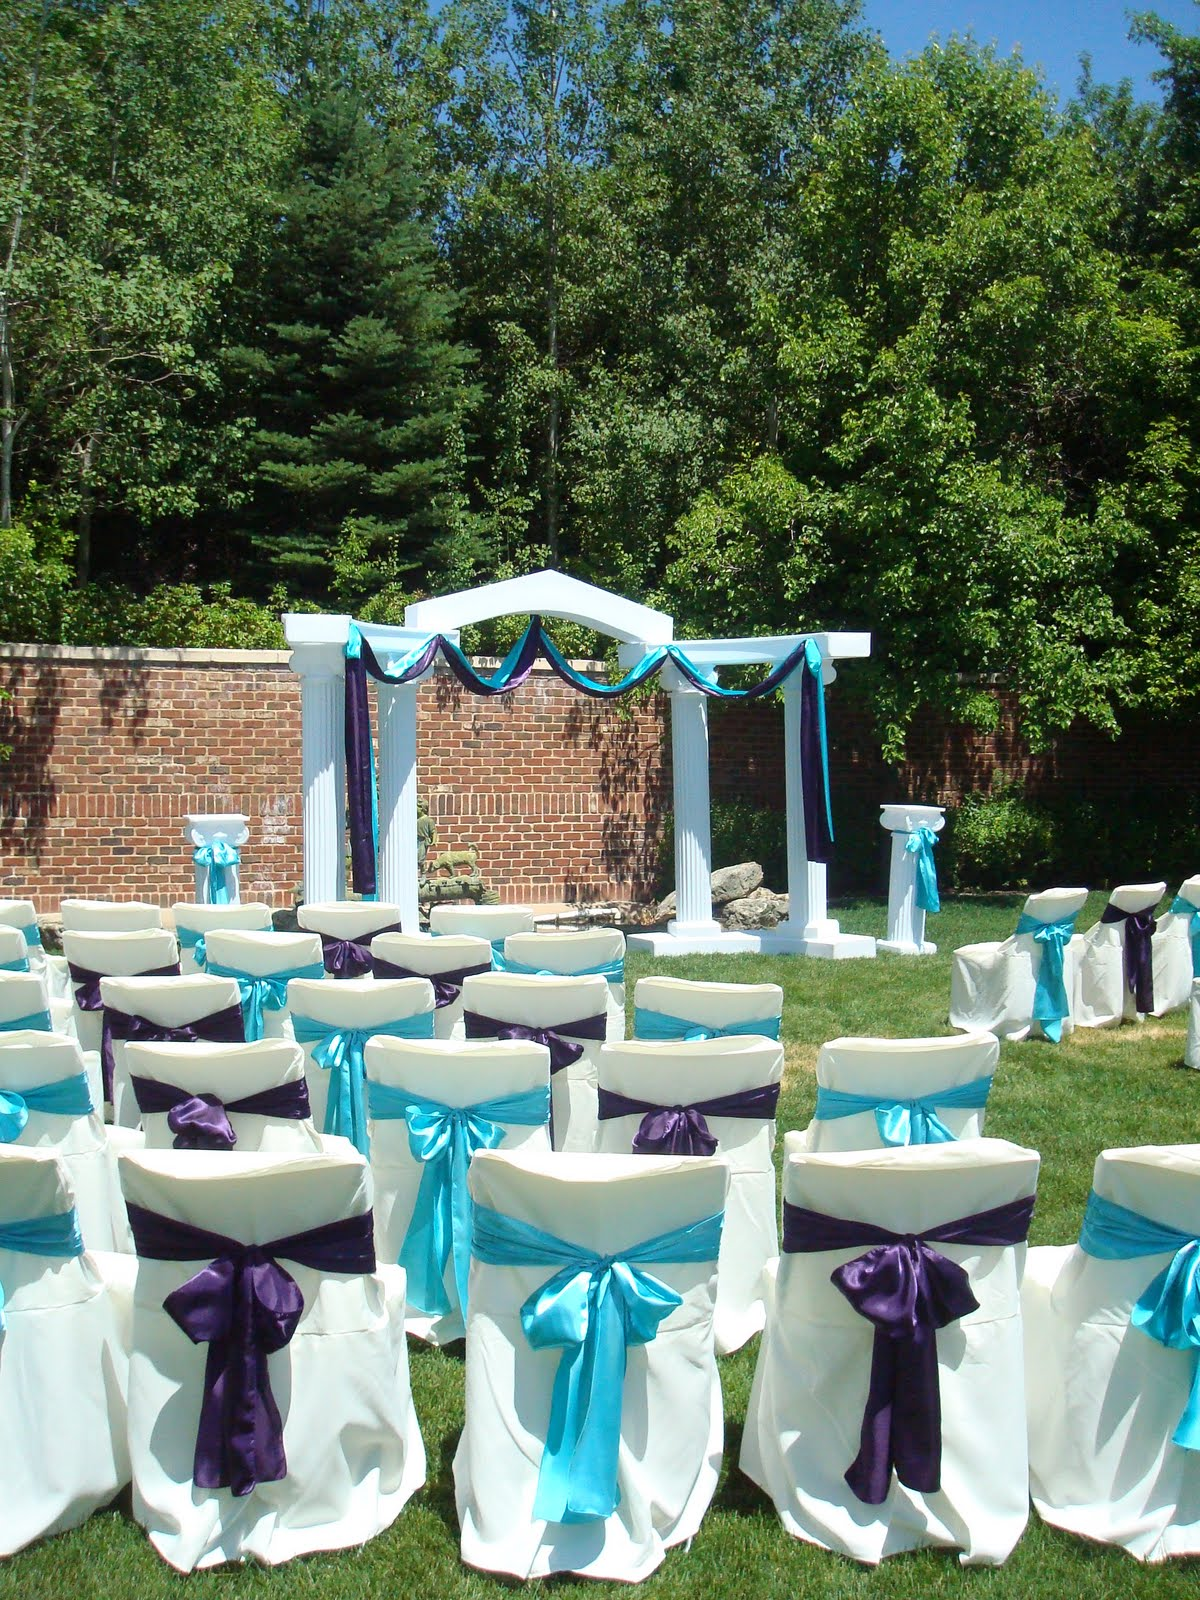 Adore your decor belleau estate utah wedding junglespirit Image collections